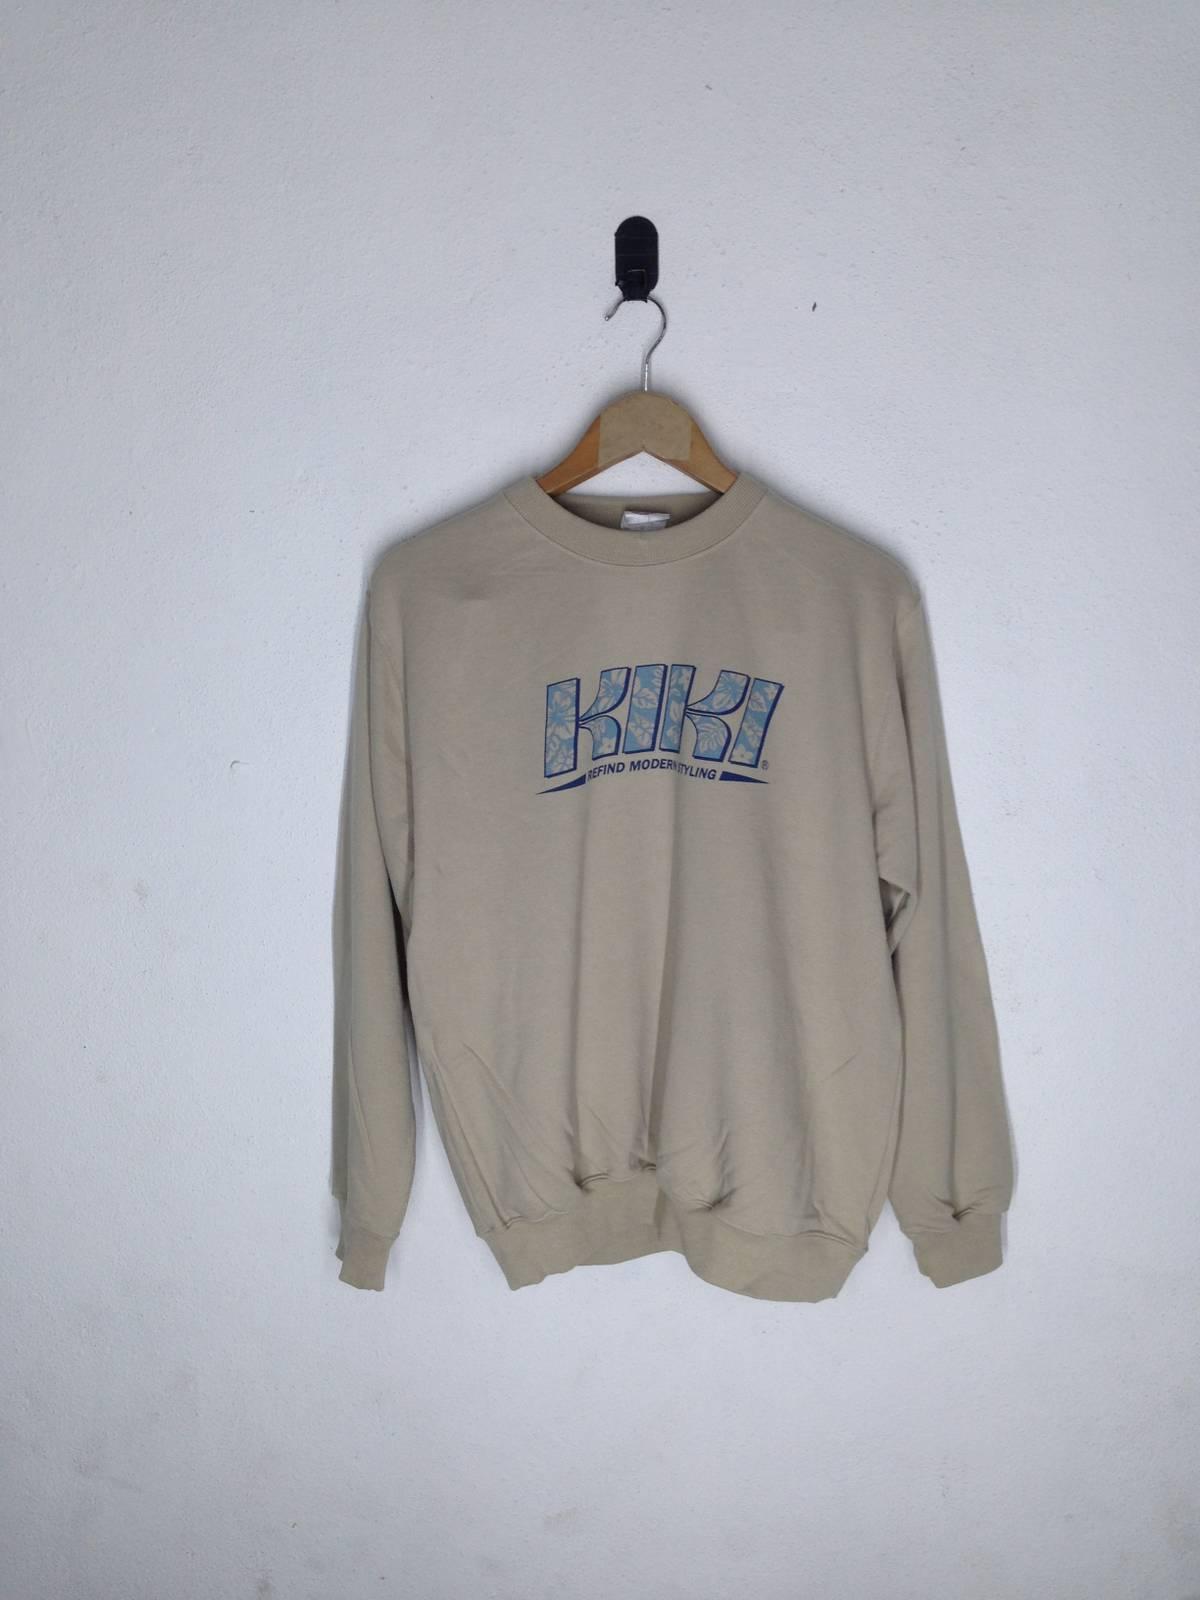 fa8d1aac Vintage Vintage Kiki Refind Modern Styling Surf Hawaii Sweatshirt / Hang Ten  / T&c Surfing / Hawaii / Size L | Grailed